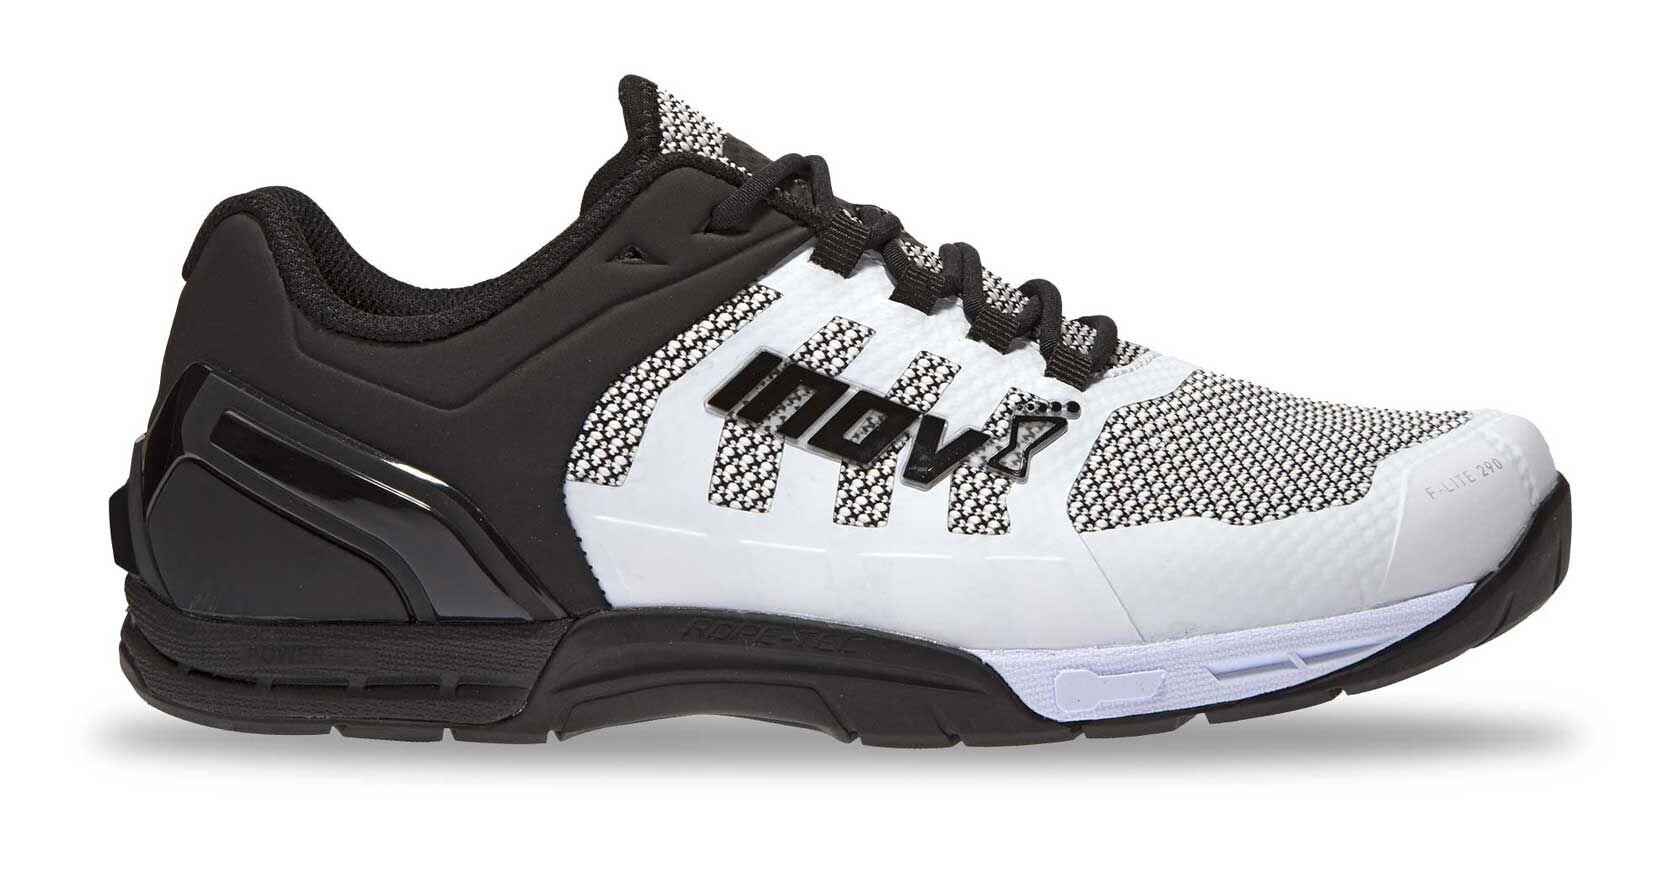 F-lite 290 Knit Men's Training Shoe